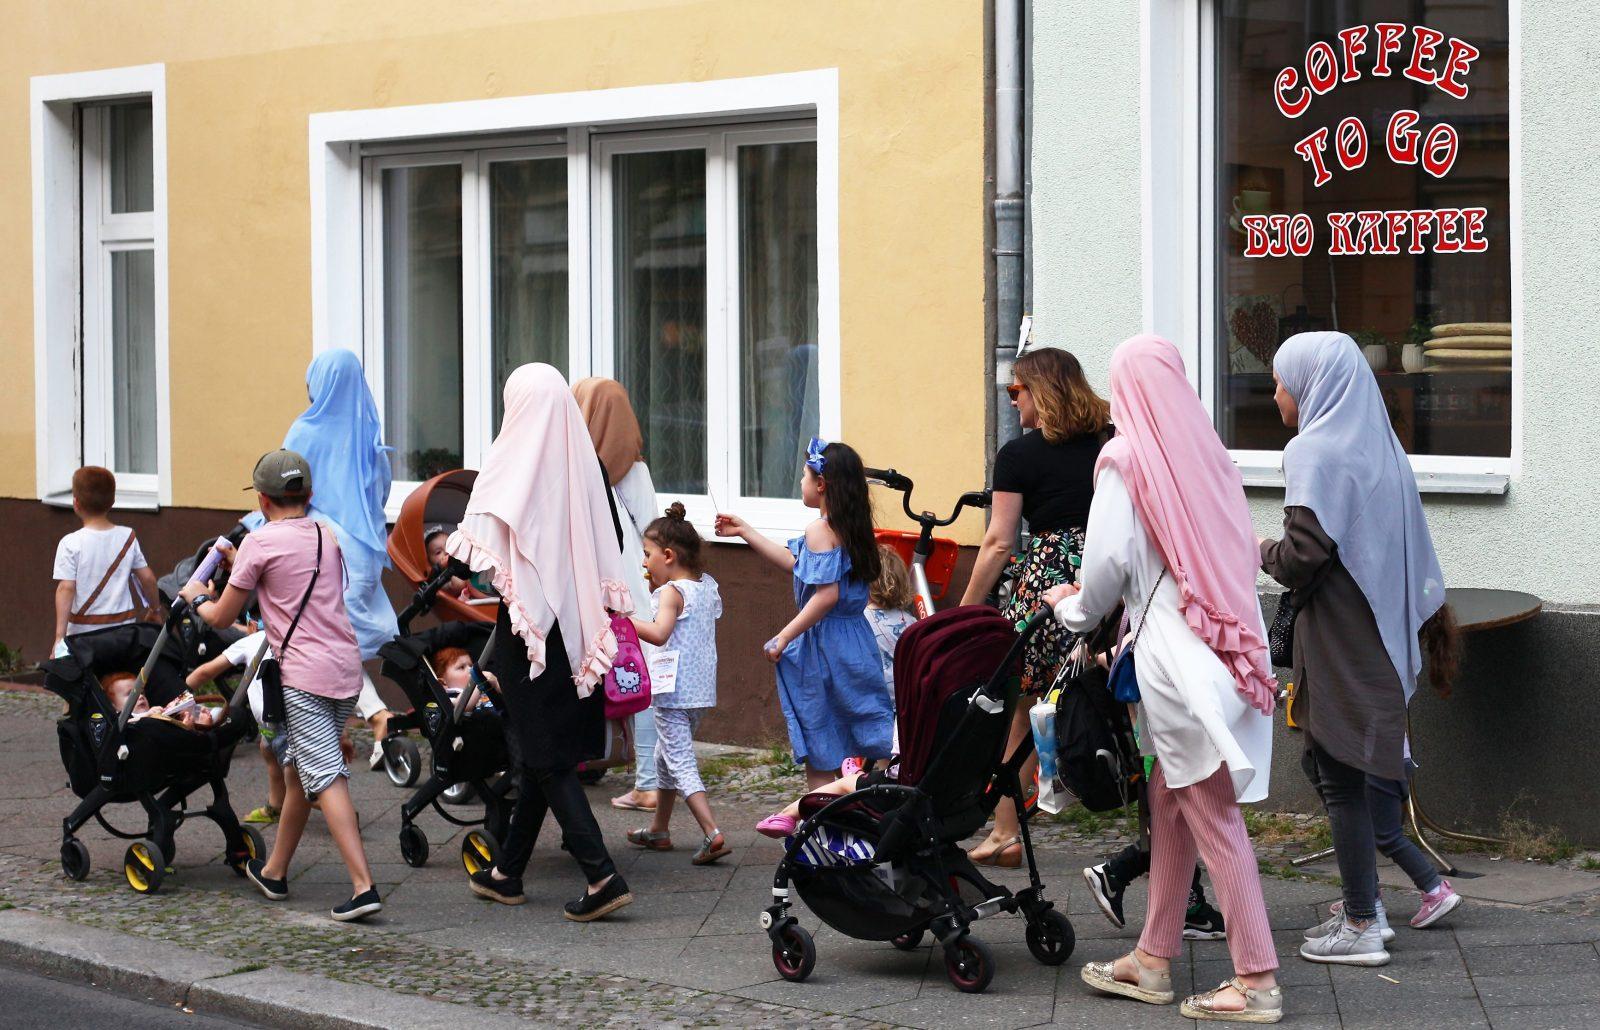 Muslimas mit Kindern